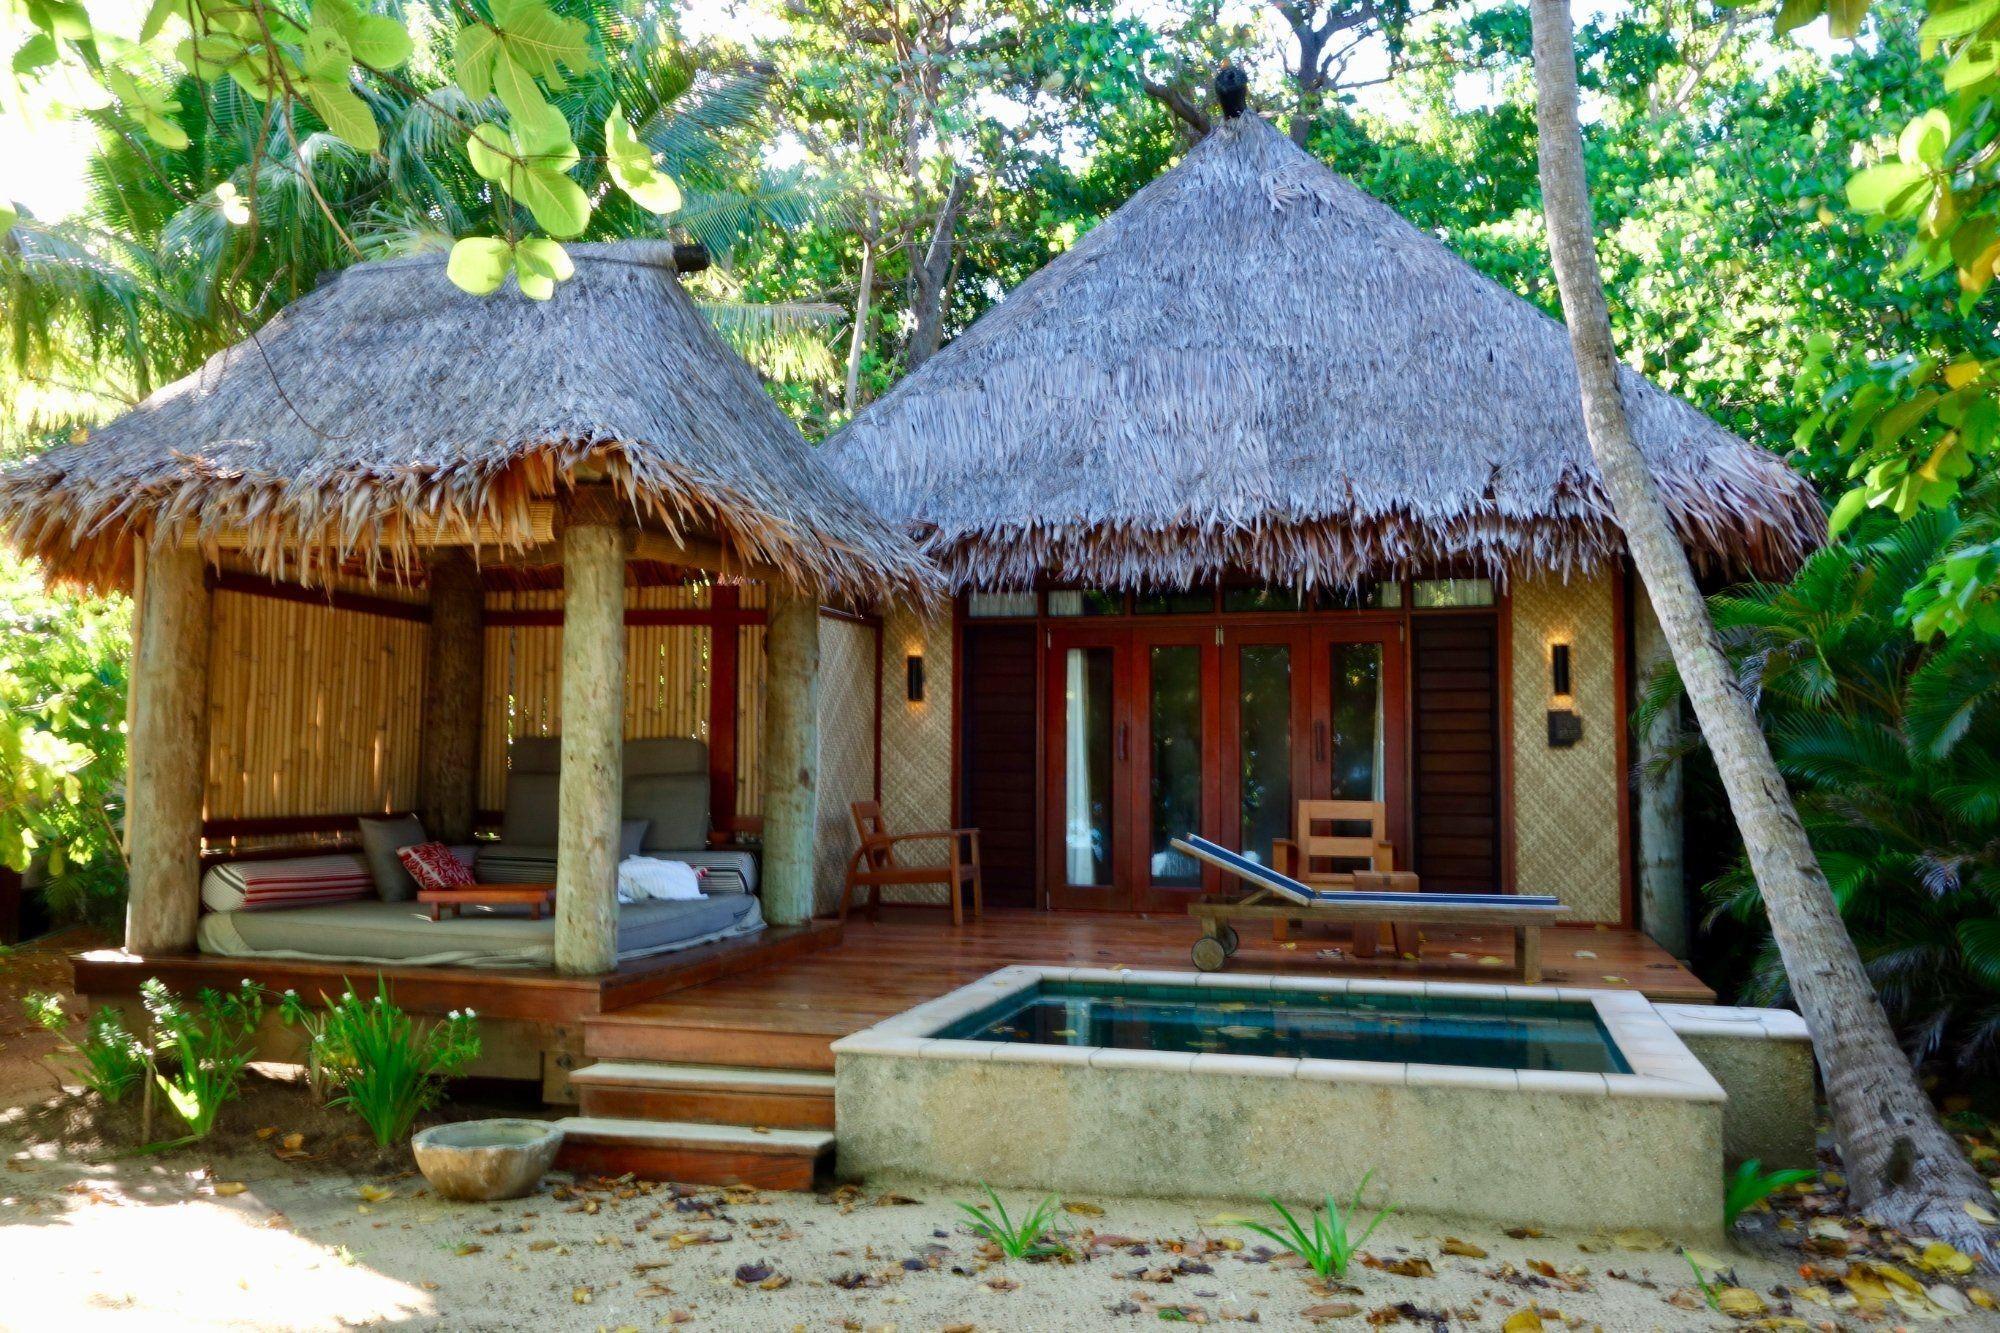 Nipa House Design Beach House Design Bamboo House Design Hut House